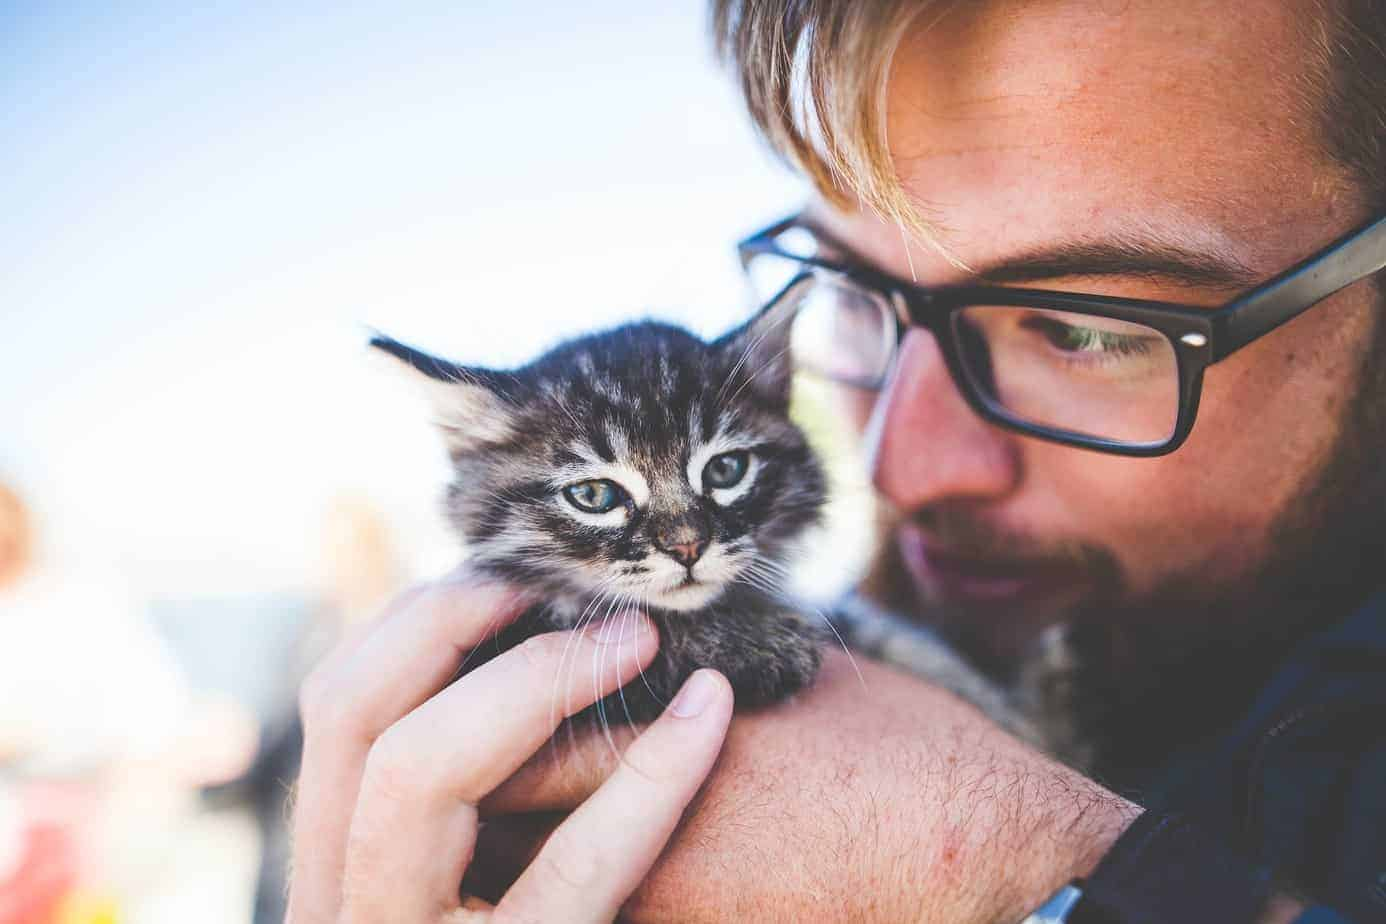 Welche Katze passt am besten zu mir?